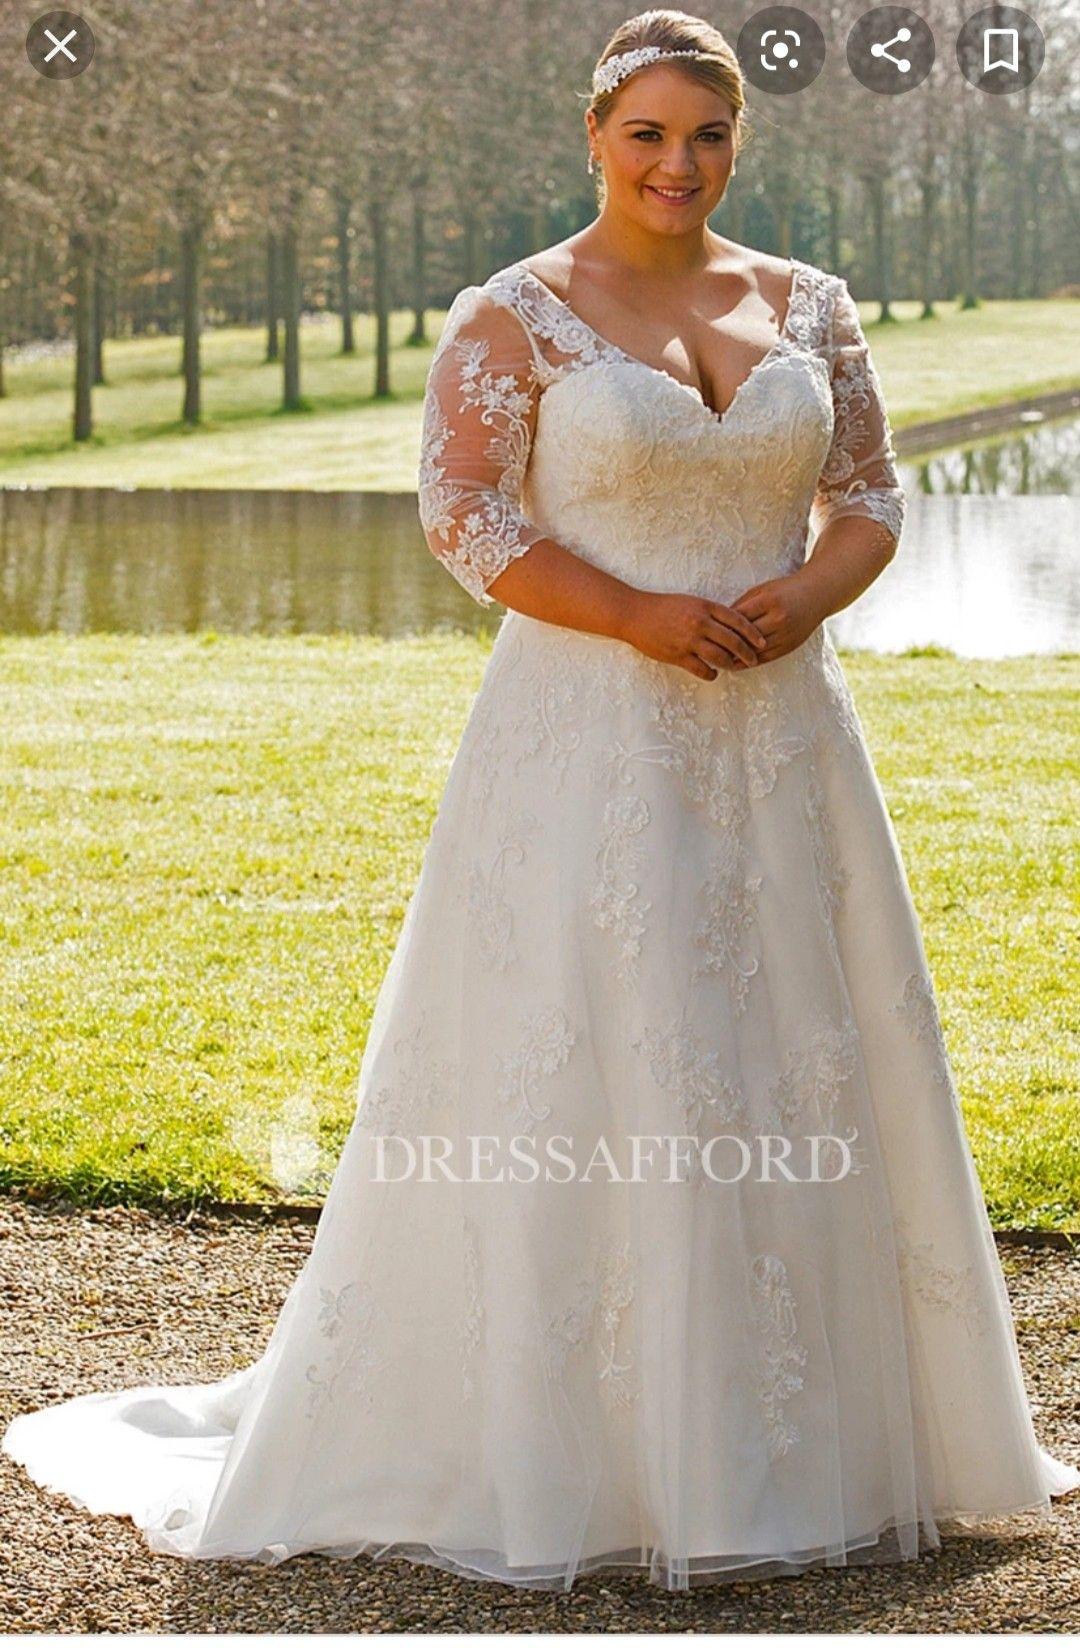 Pin By Katie Teal On Purple Winter Wedding In 2020 Plus Wedding Dresses Cheap Wedding Dress Wedding Dresses Plus Size [ 1648 x 1080 Pixel ]